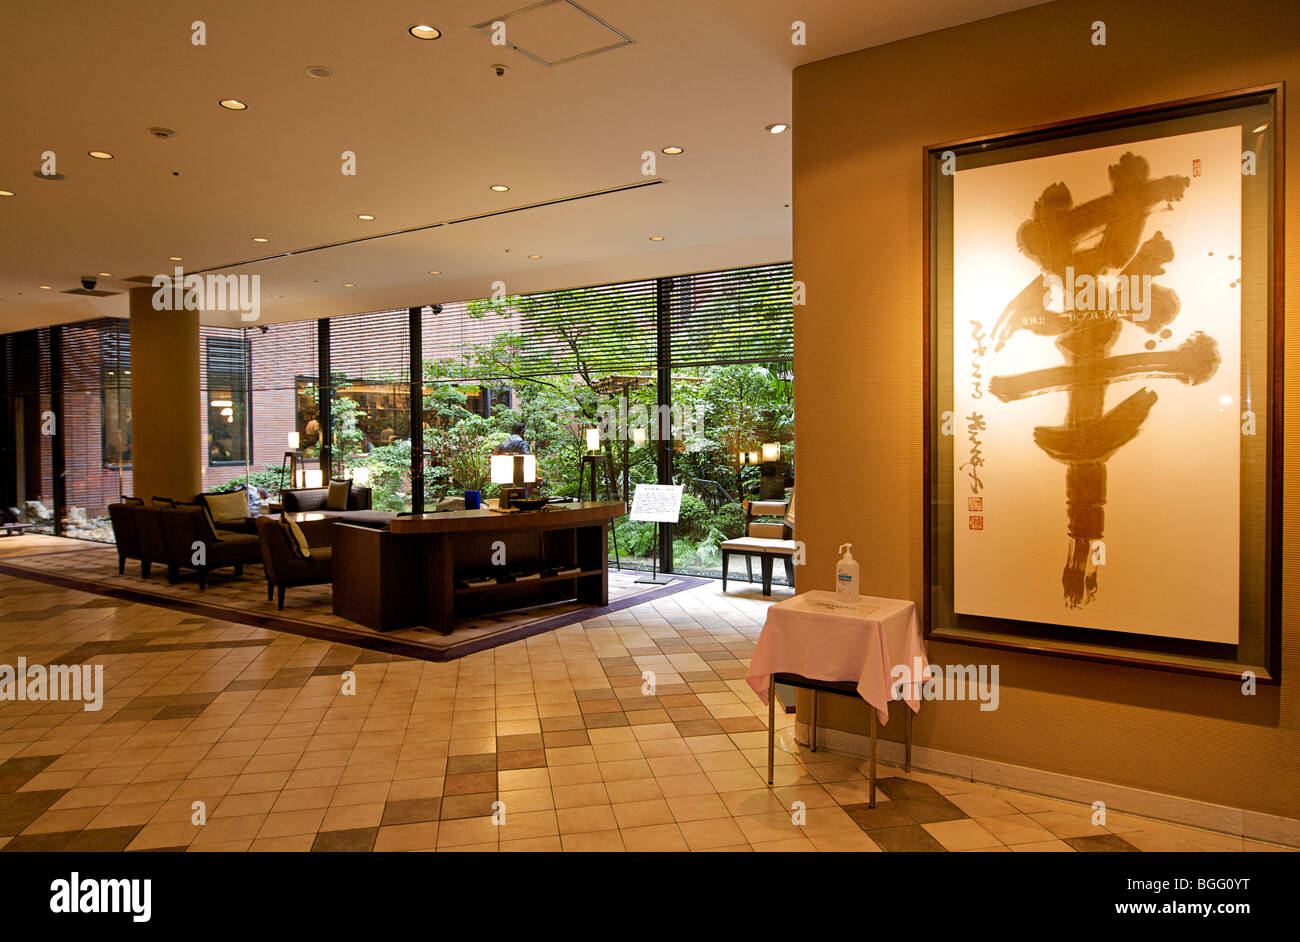 Mitsui Garden Hotel Sanjo foyer, Kyoto, Japan - Stock Image